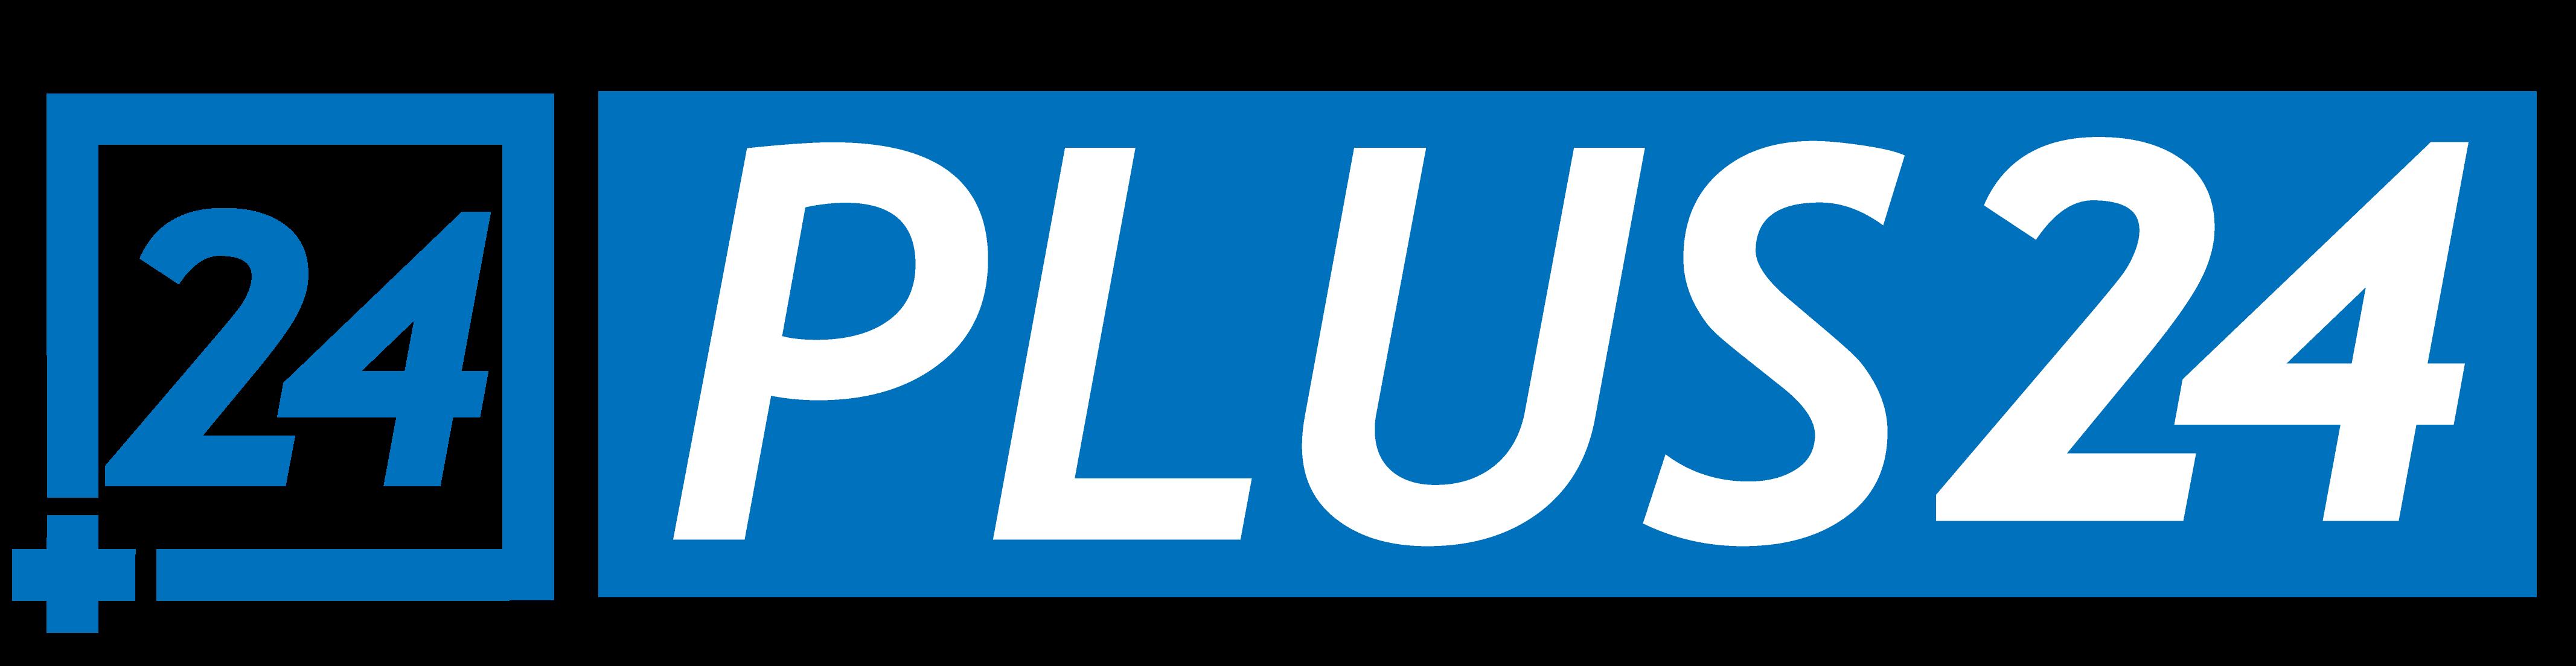 بلوس24 | Plus24